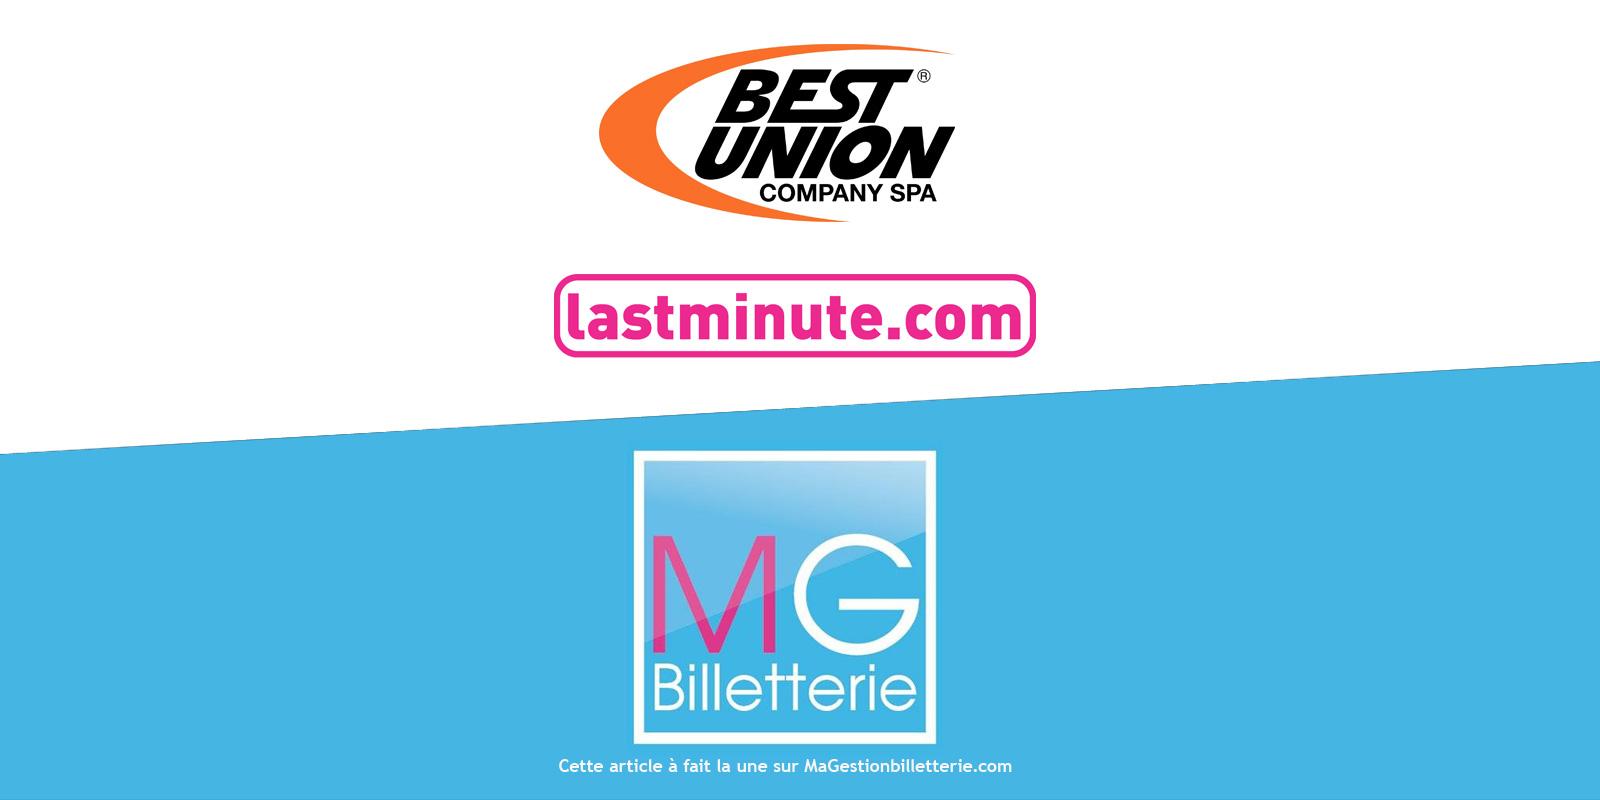 bestunion-lastminute-une3